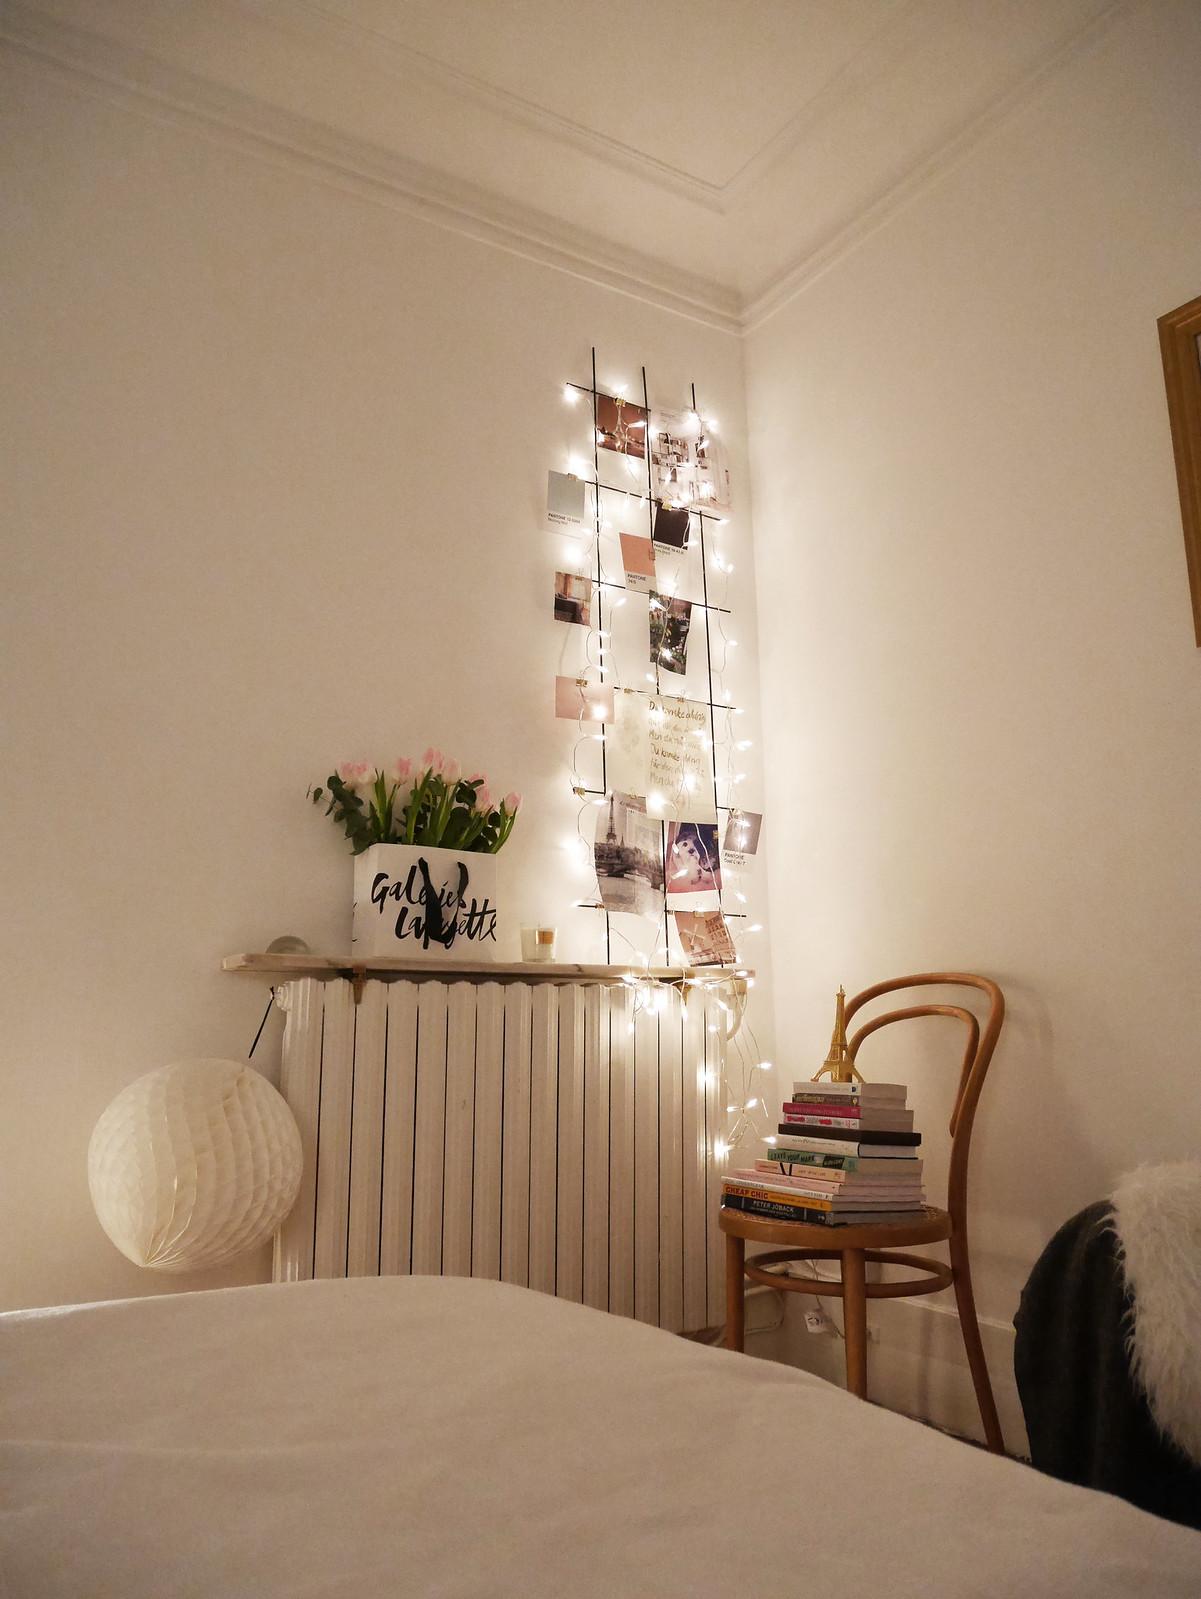 My home interior